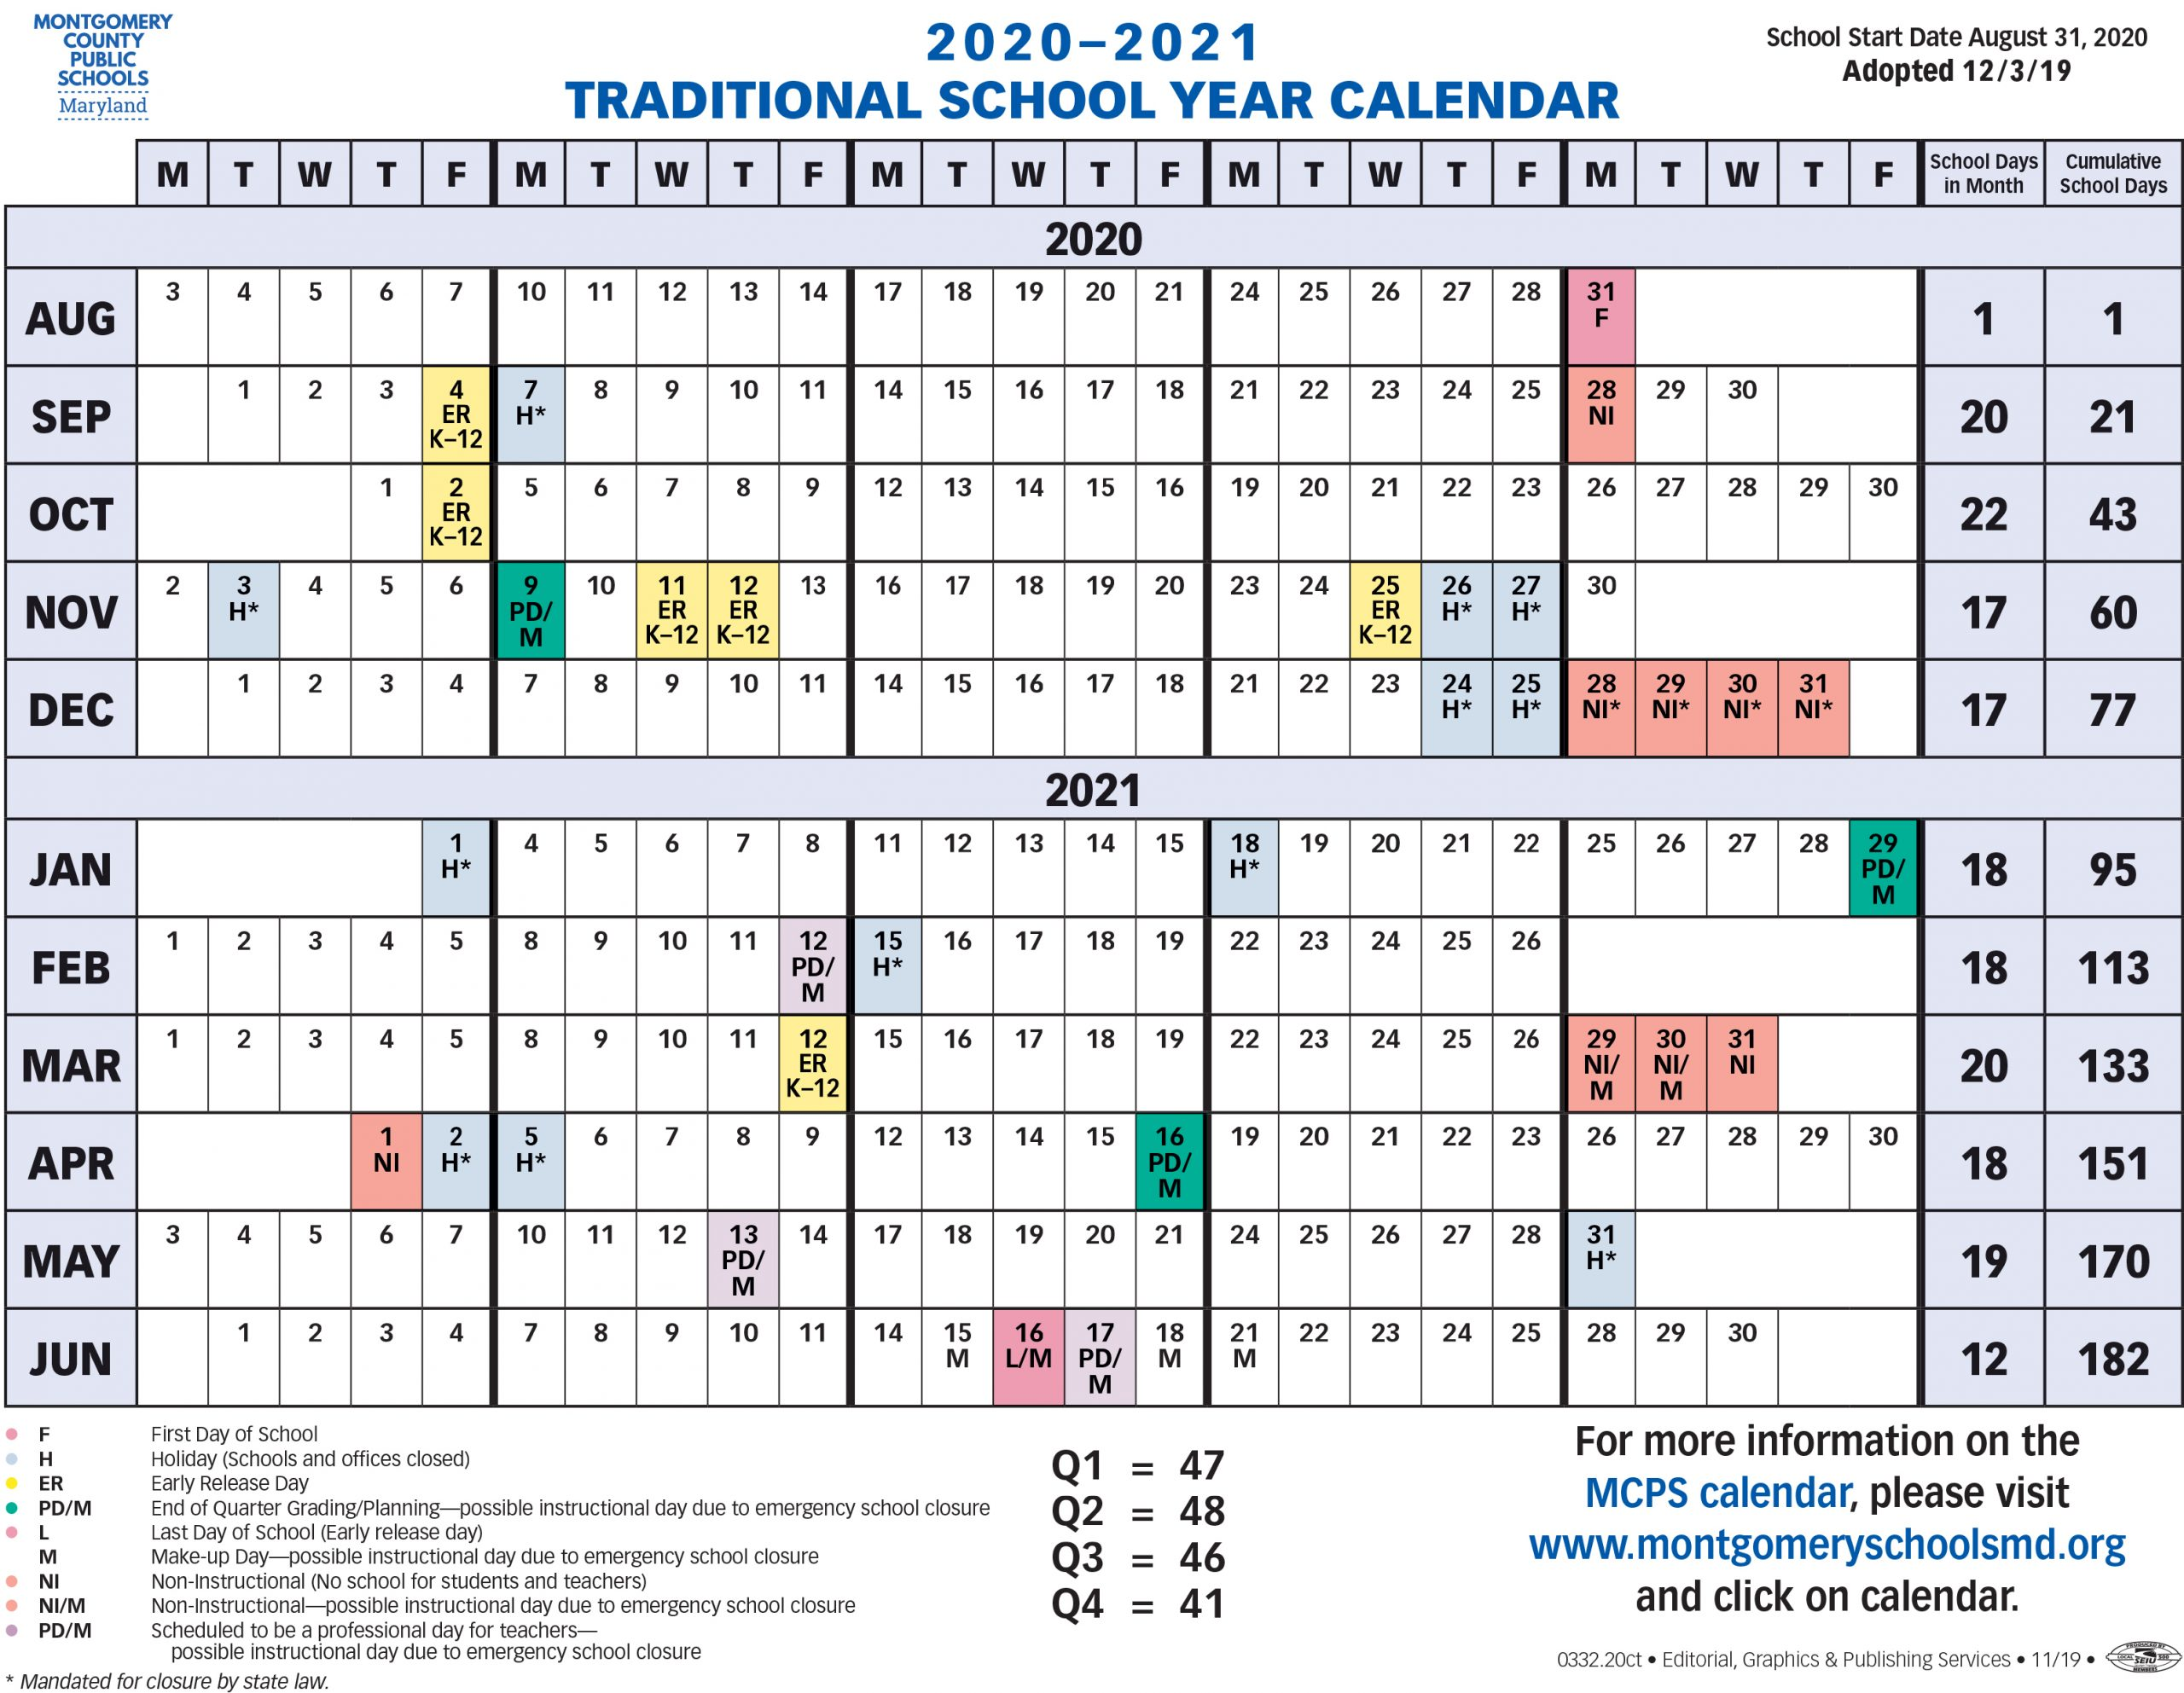 Proposed Calendar 2020-2021 - Montgomery County Public